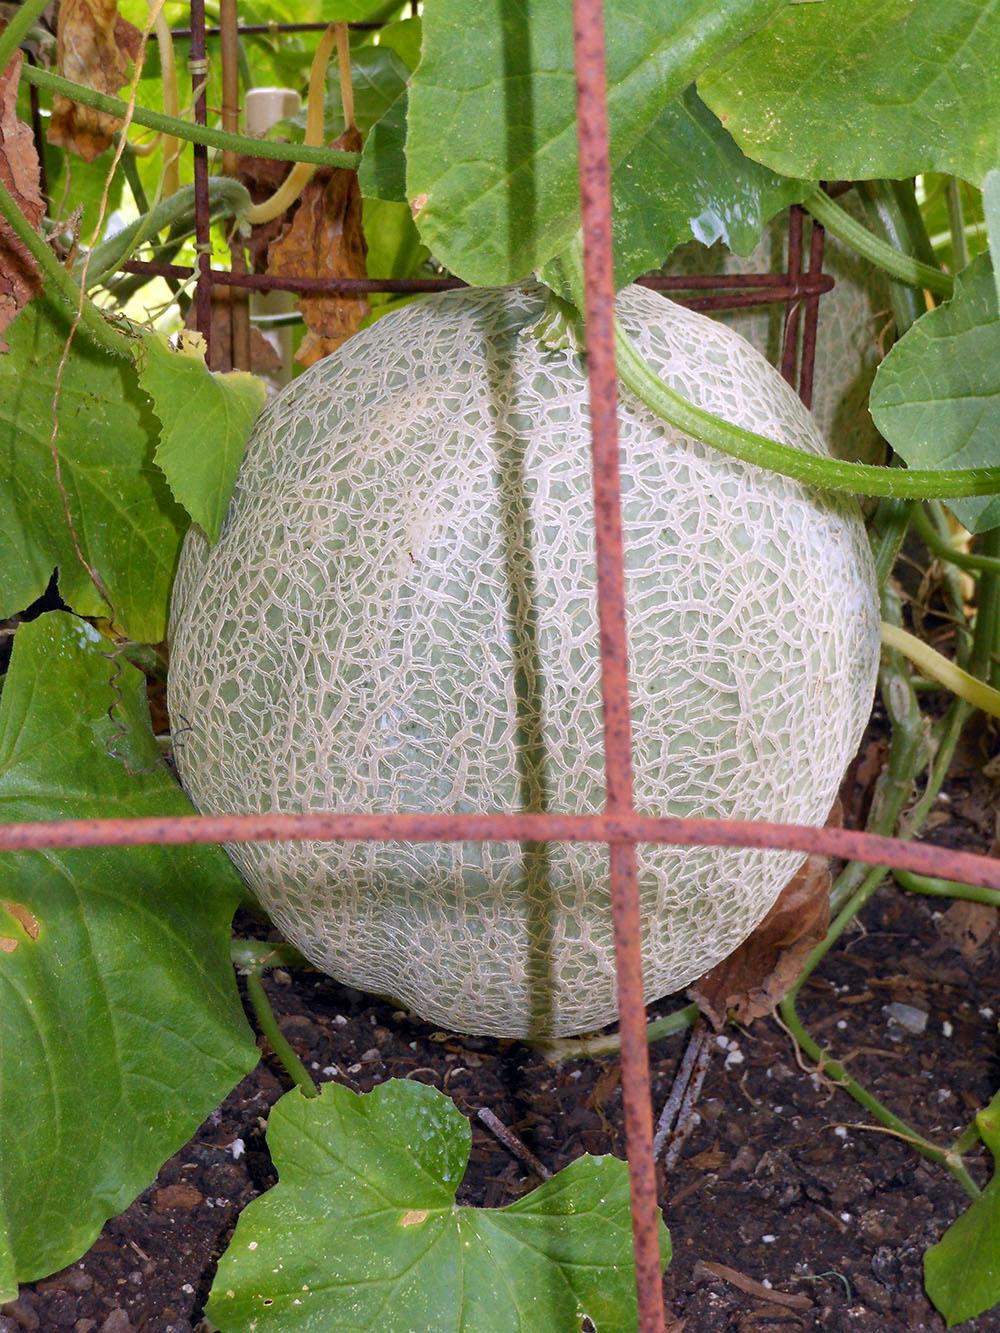 08-04-2016 Cantaloupe Plant 08